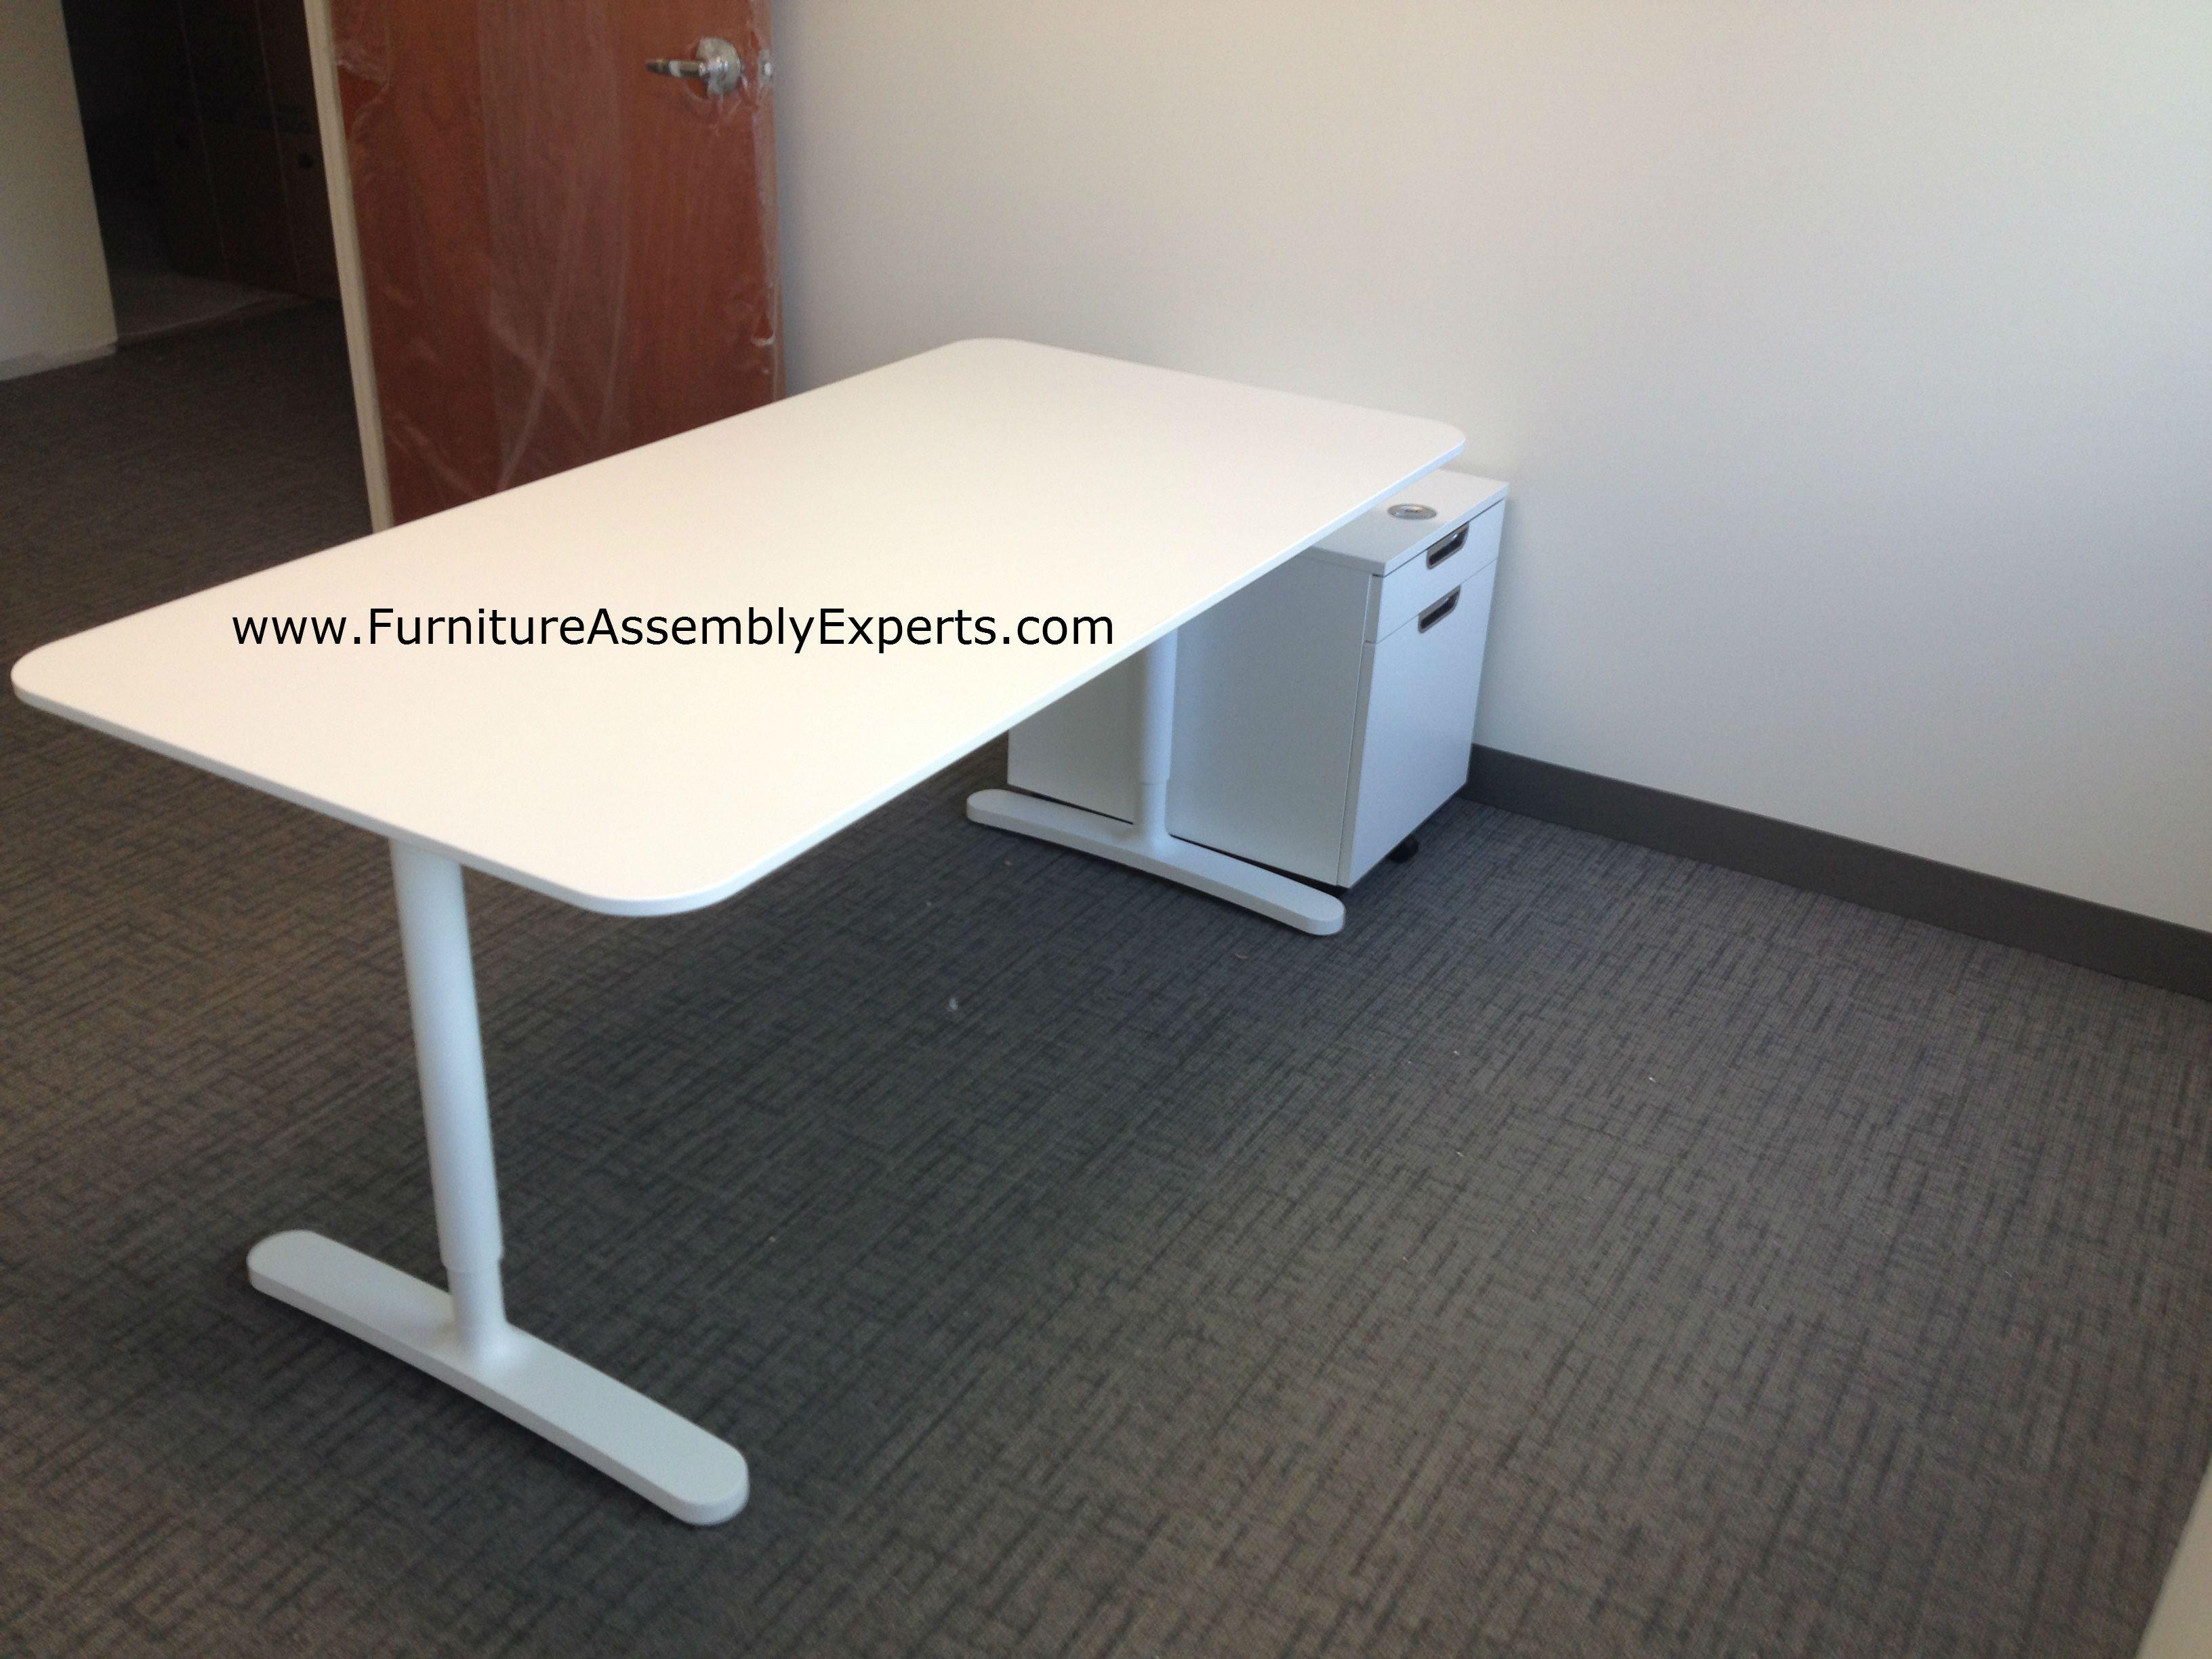 assembled office desks. ikea bekant office desk and file cabinet assembled in germantown md by furniture assembly experts llc desks c